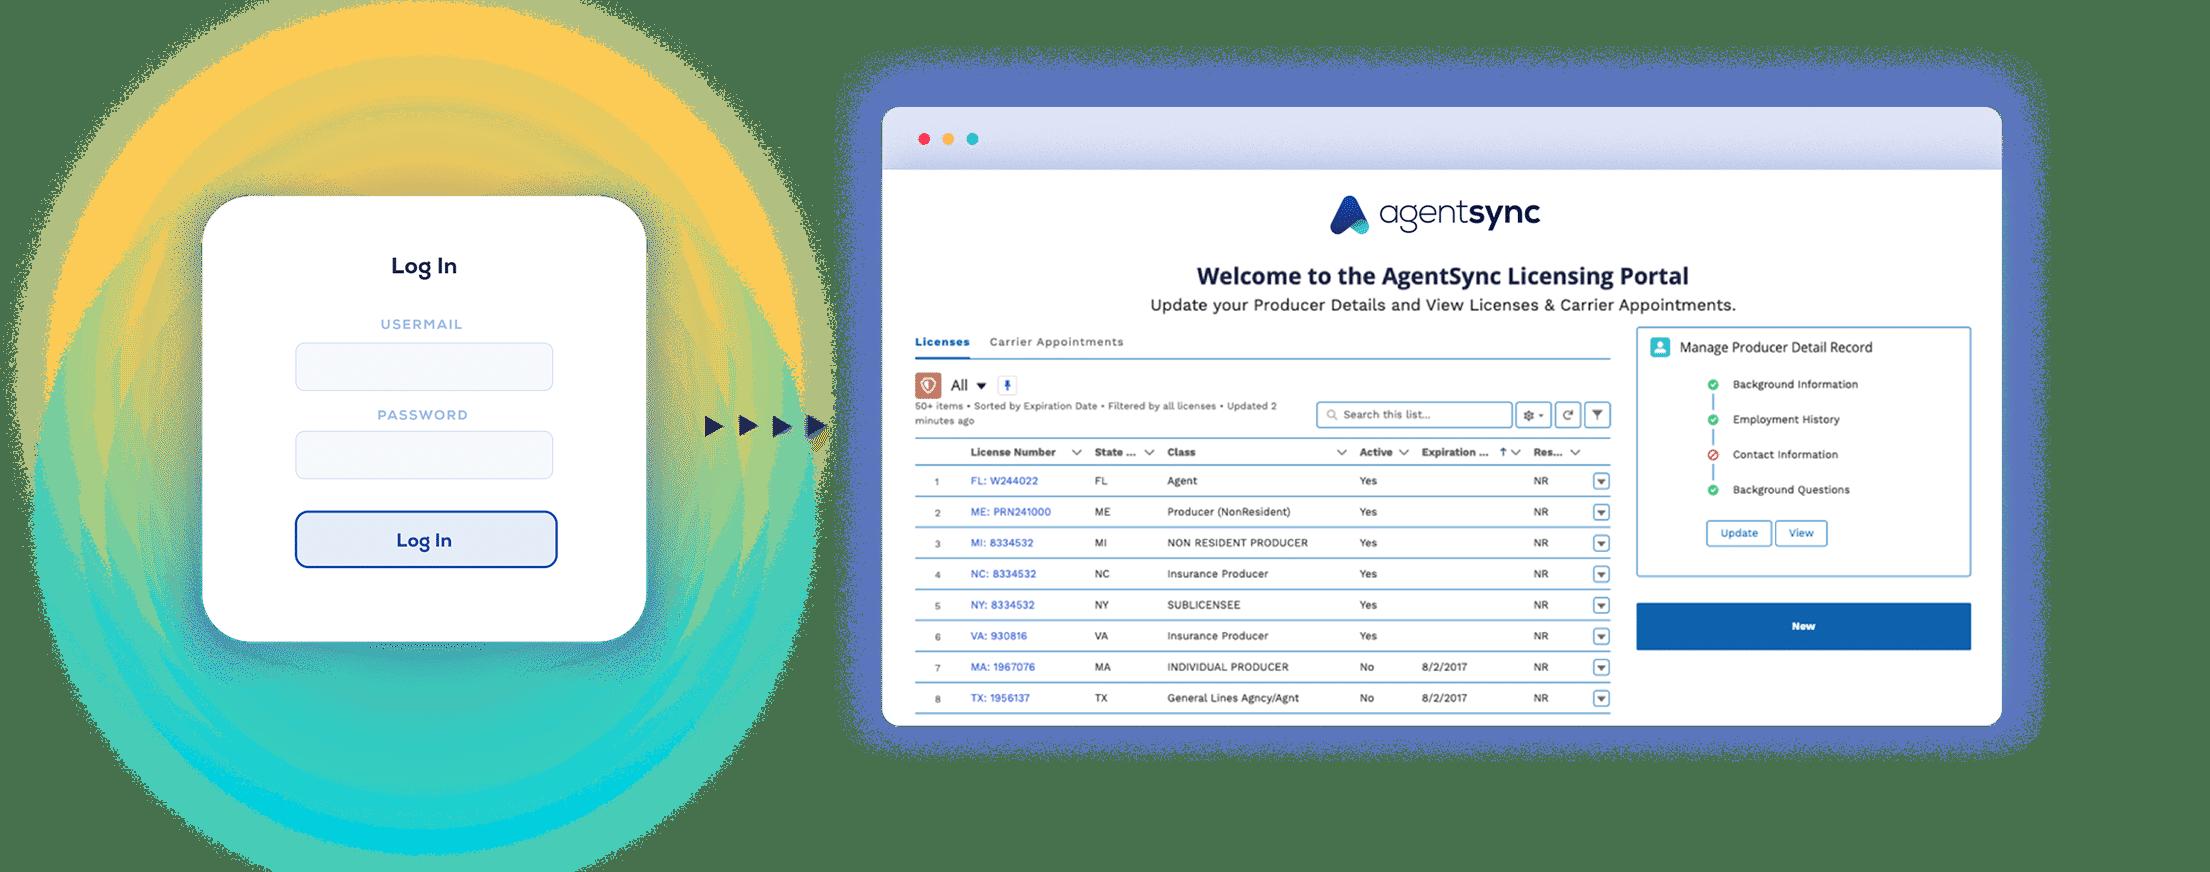 AgentSync Agent Portal Screenshot